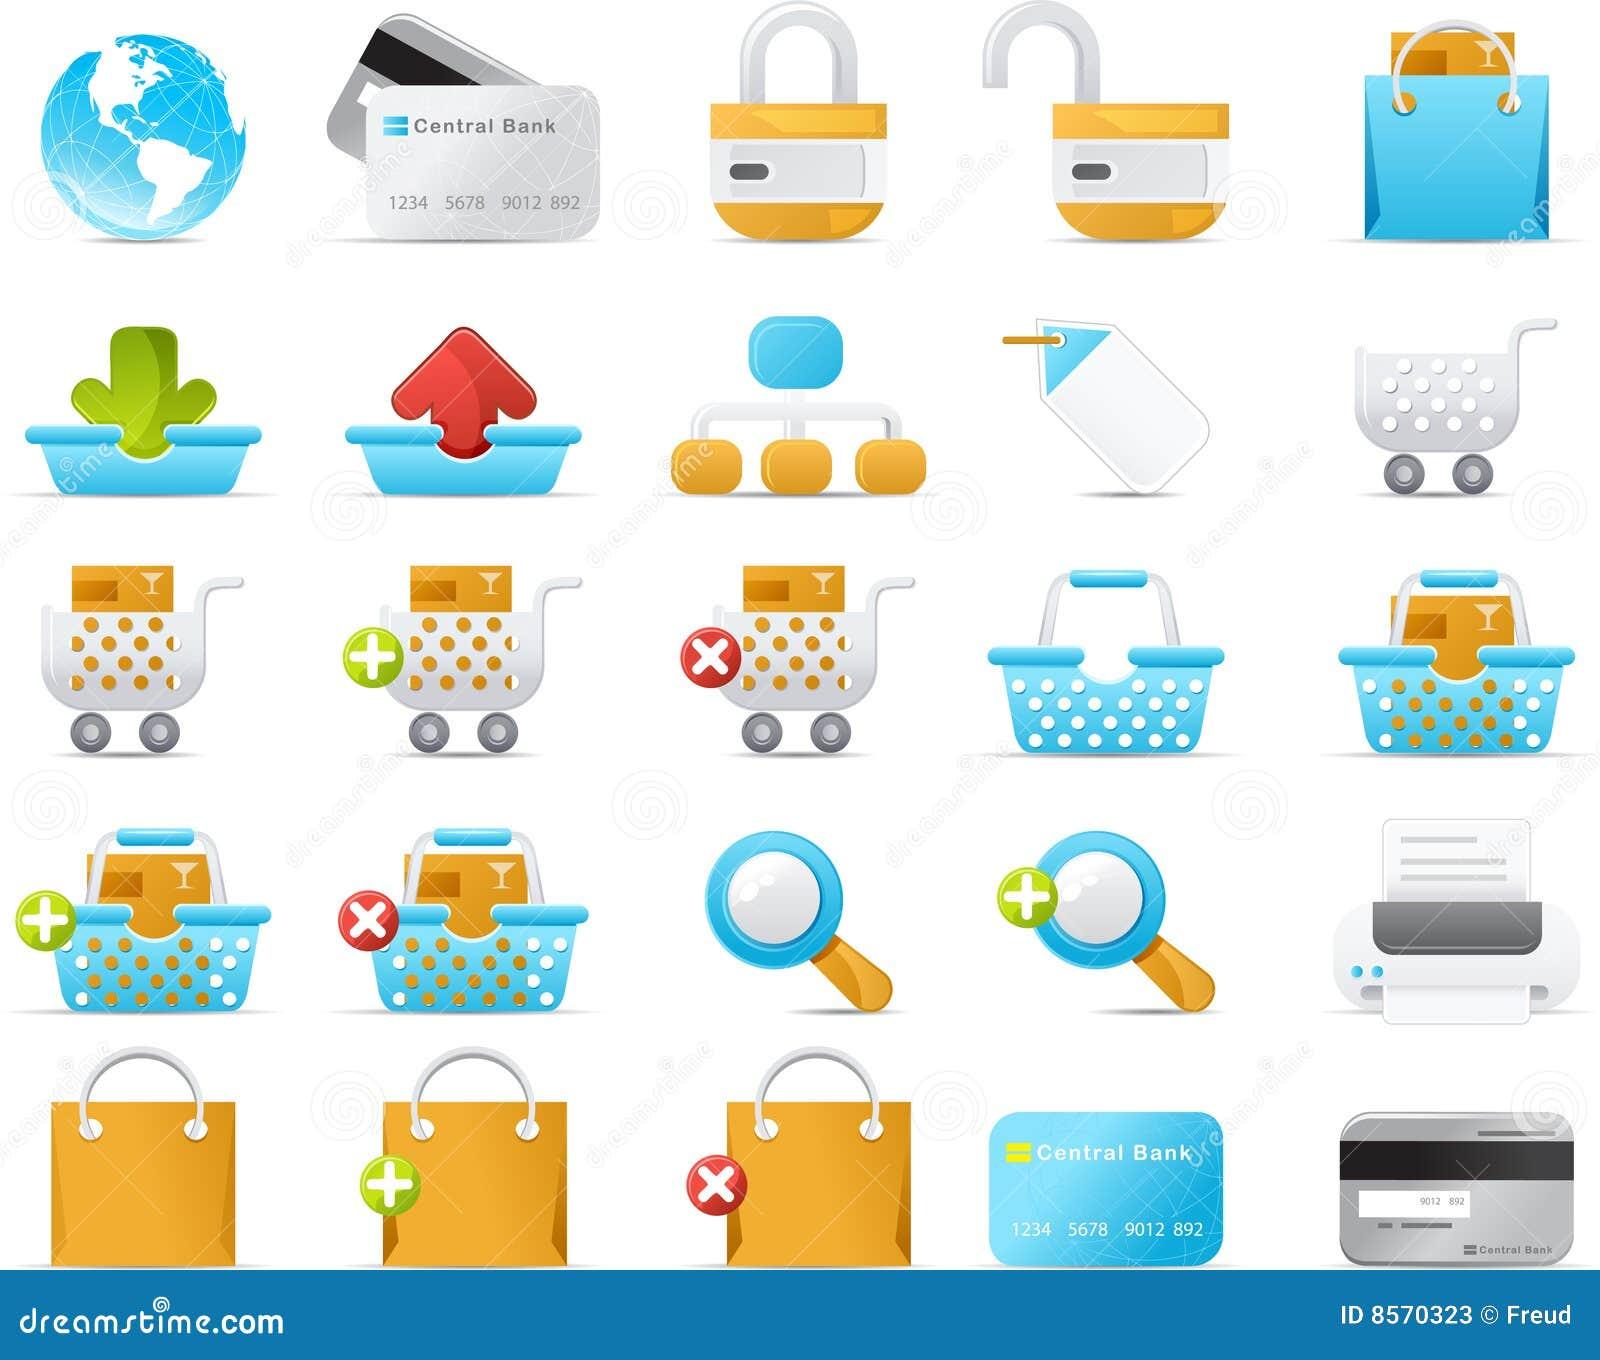 Nouve icon set: Internet and e-Commerce